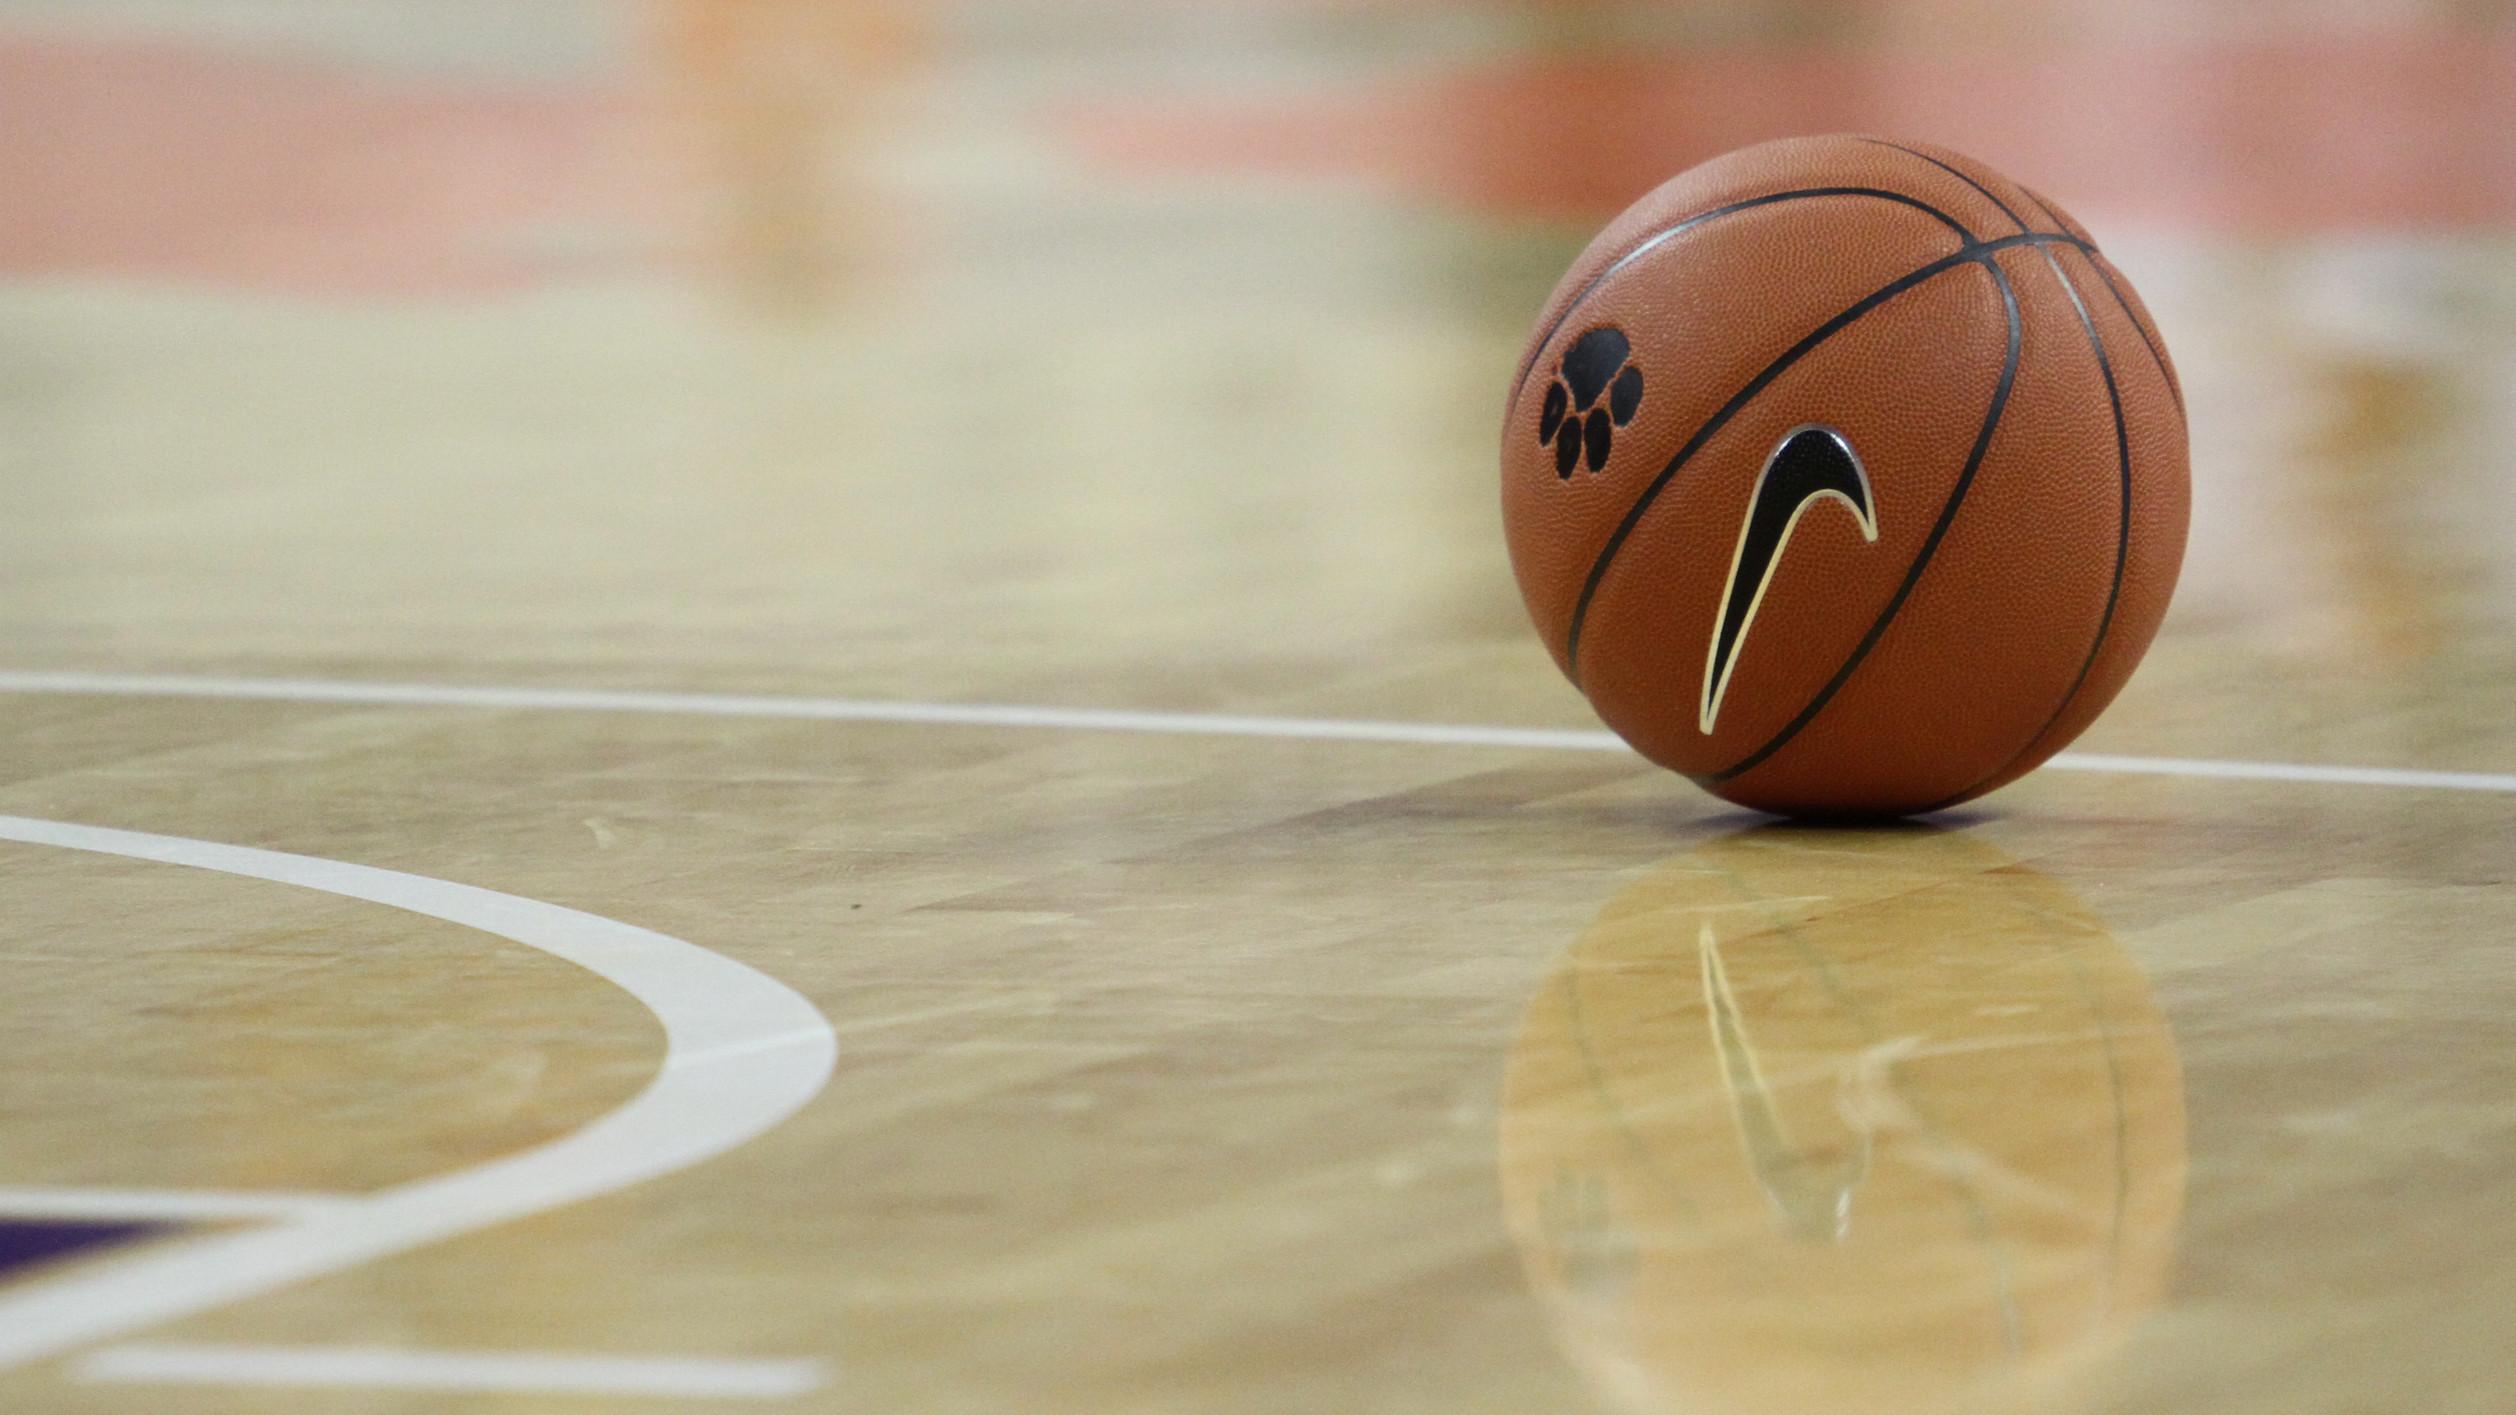 Student Rewards Program Announced for Women's Hoops